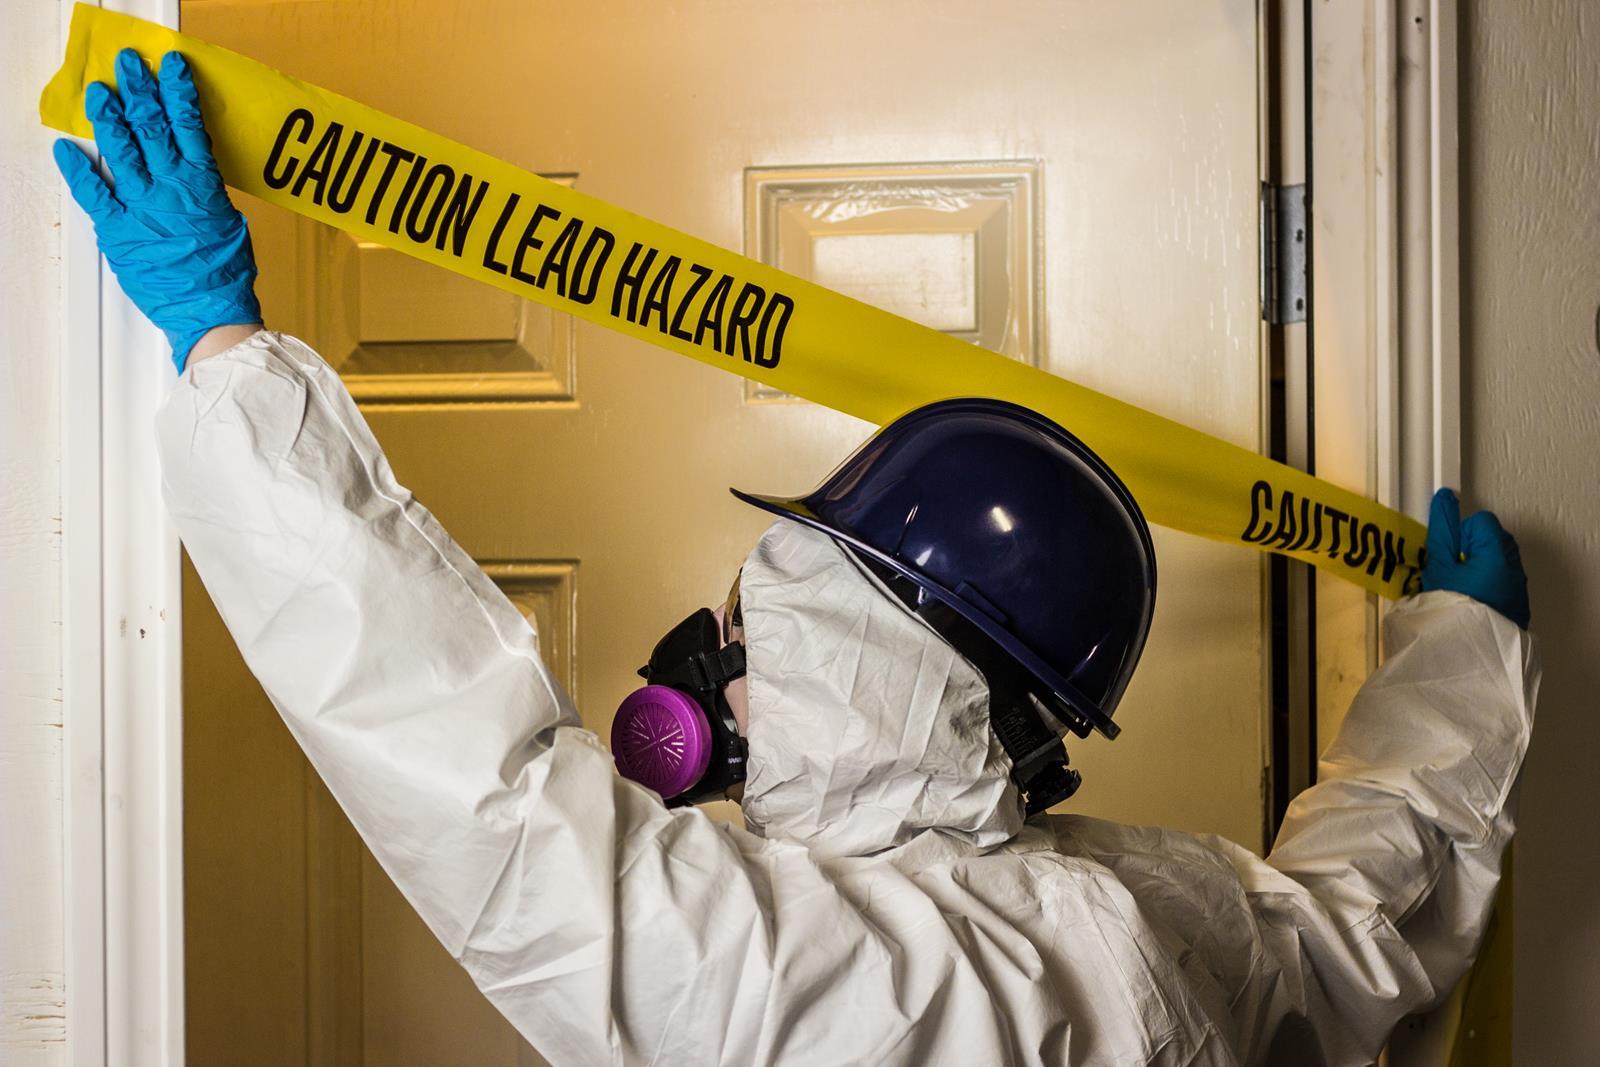 Caution Tape Lead Hazard